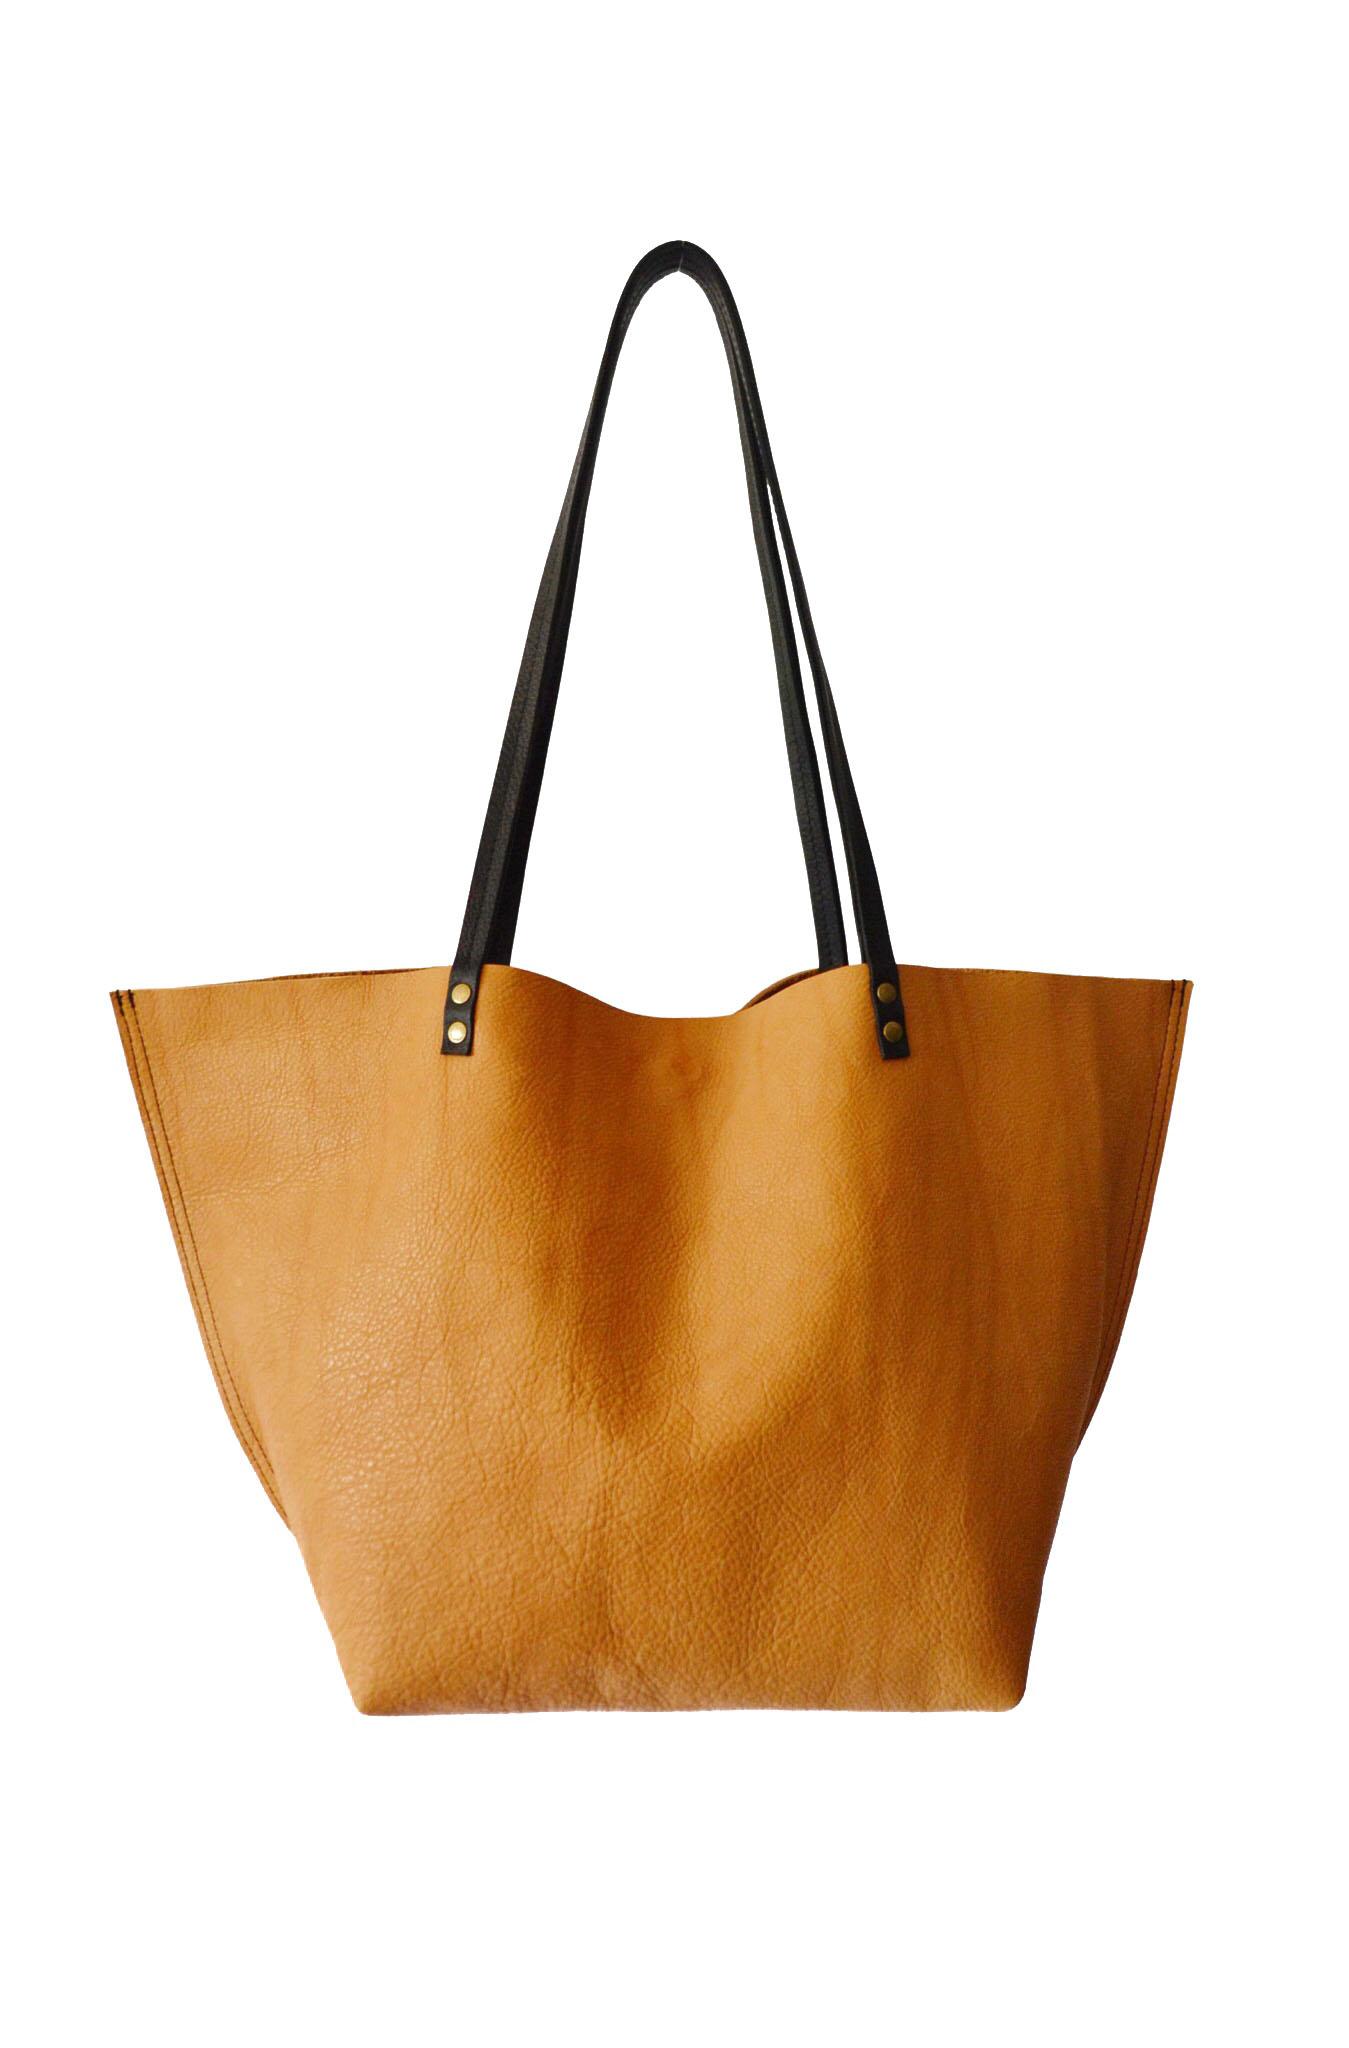 Jessica Tote in Honey Gold  - Lann Designs • $188